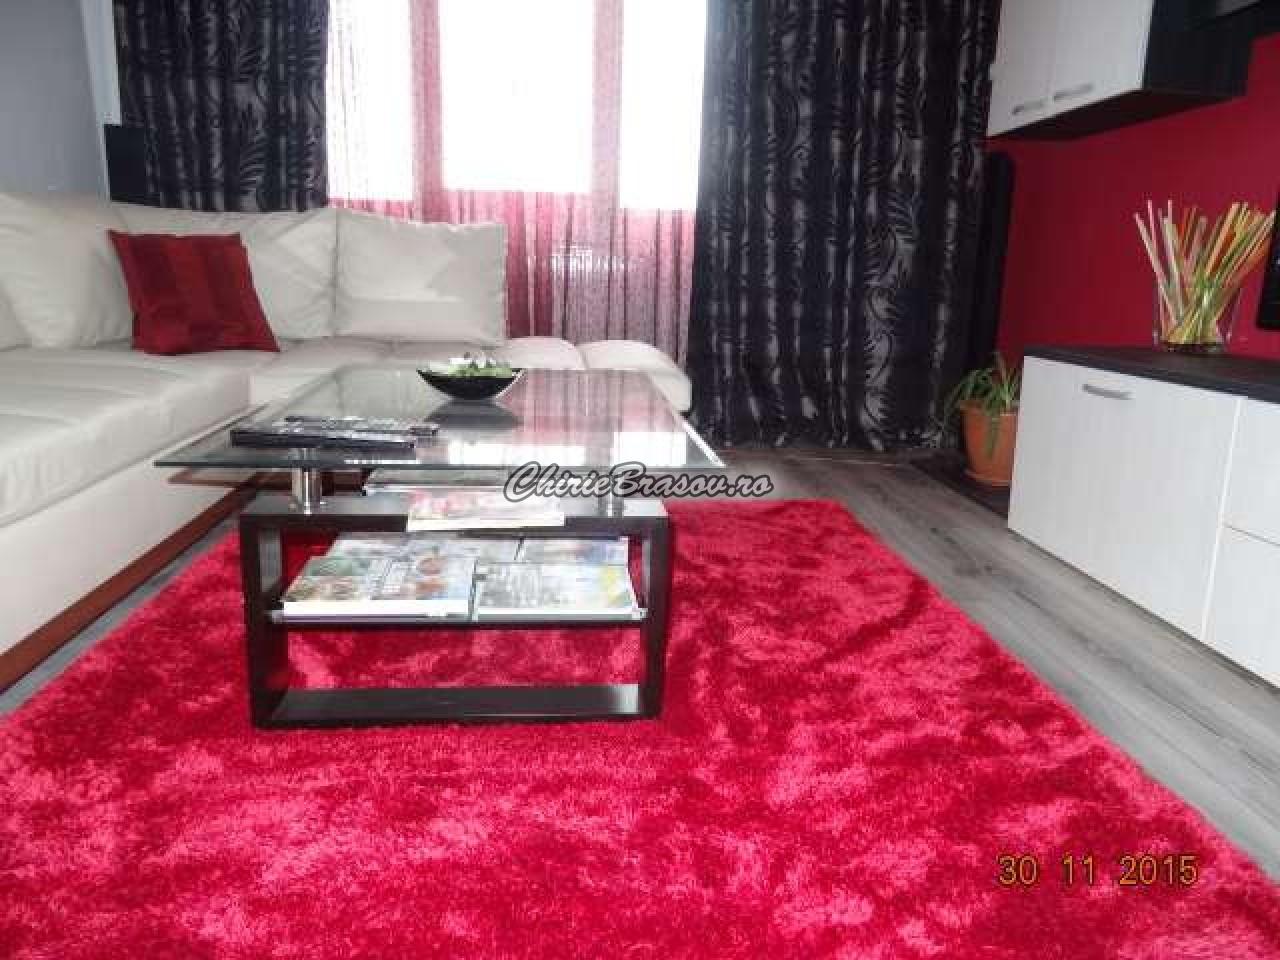 Chirie Brasov apartament 3 camere zona Grivitei-354-0